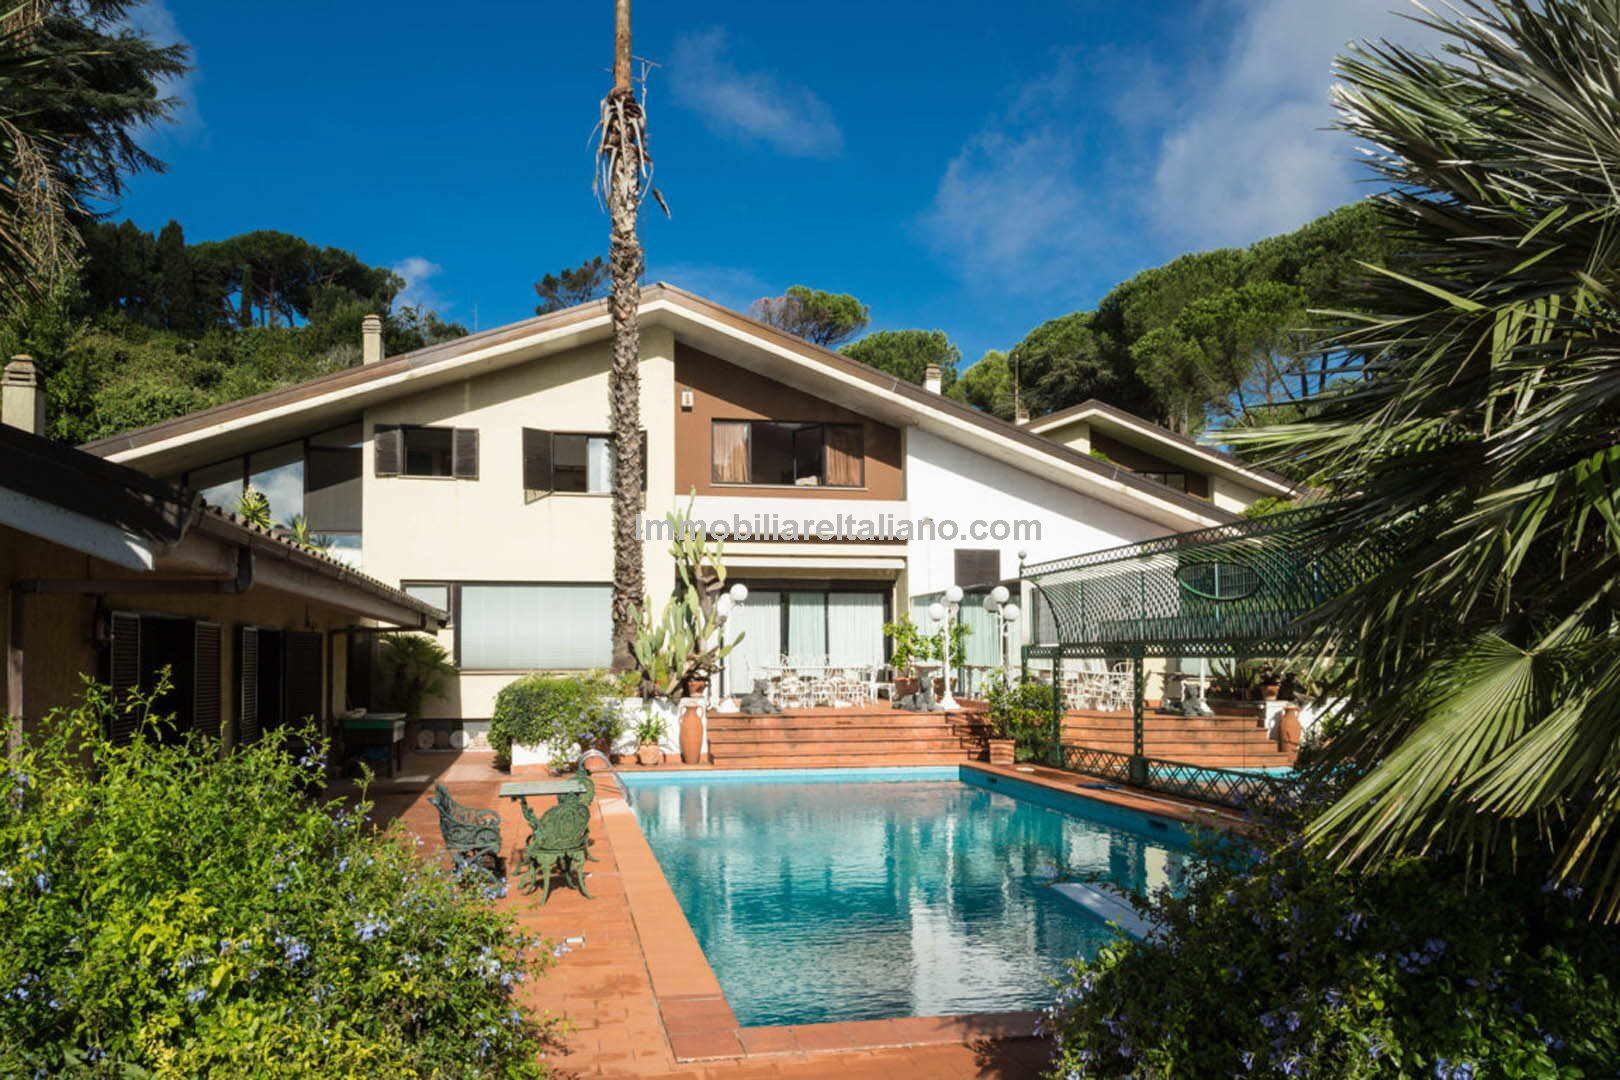 Rome villa property – Monte Mario